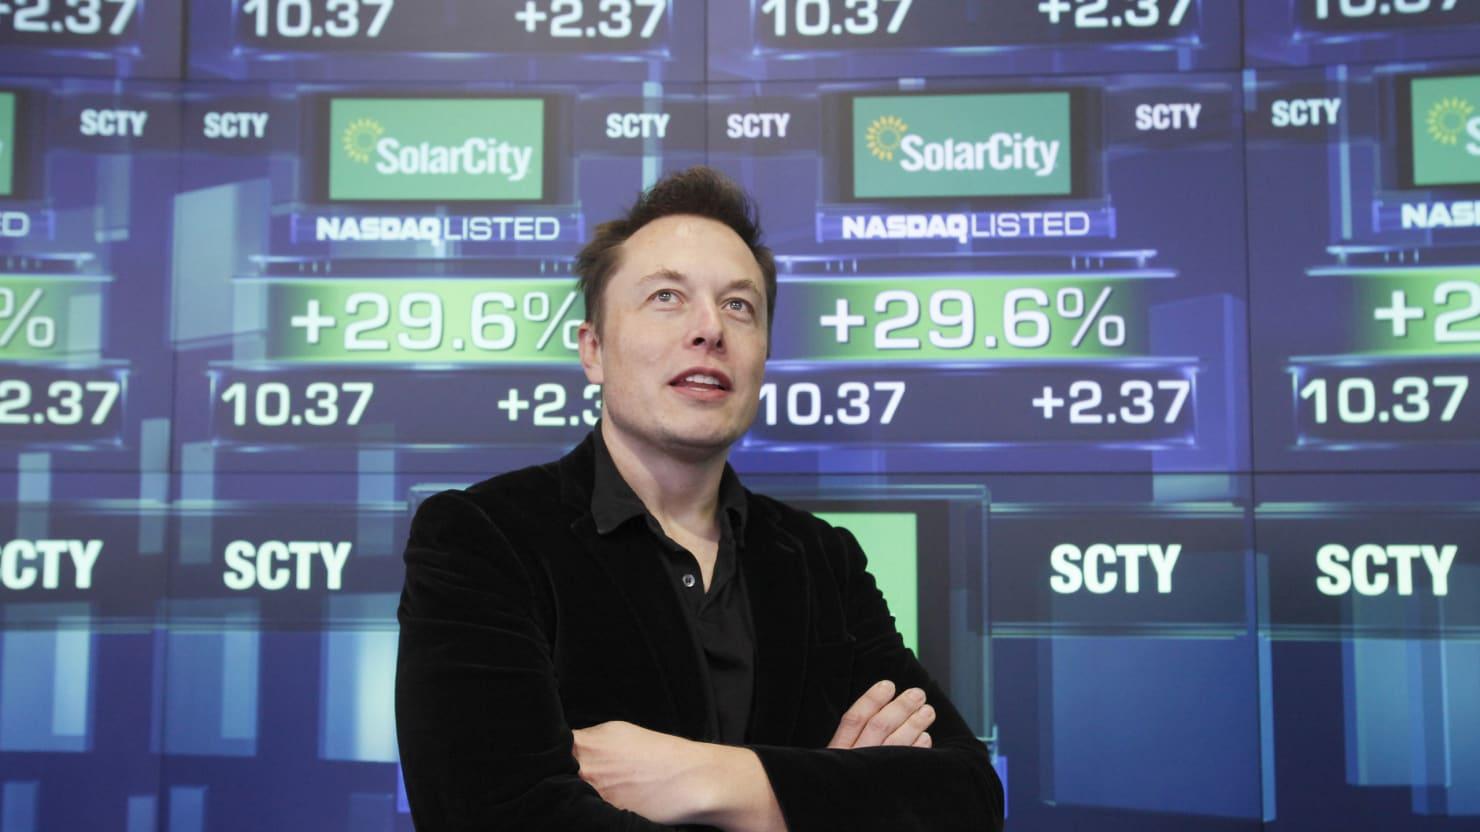 Elon Musk-Backed SolarCity Thrives in Solar Power Sector